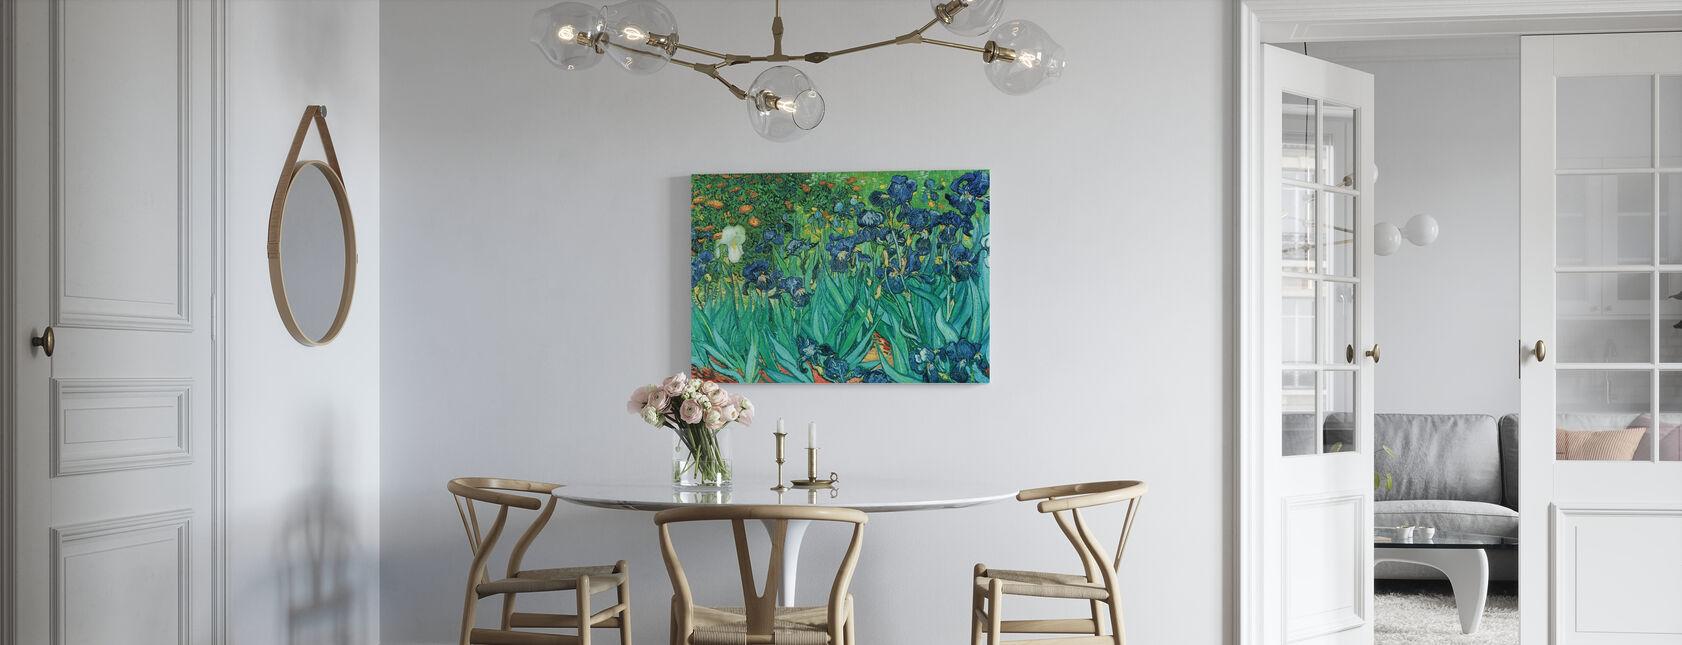 Irissen, Vincent van Gogh - Canvas print - Keuken